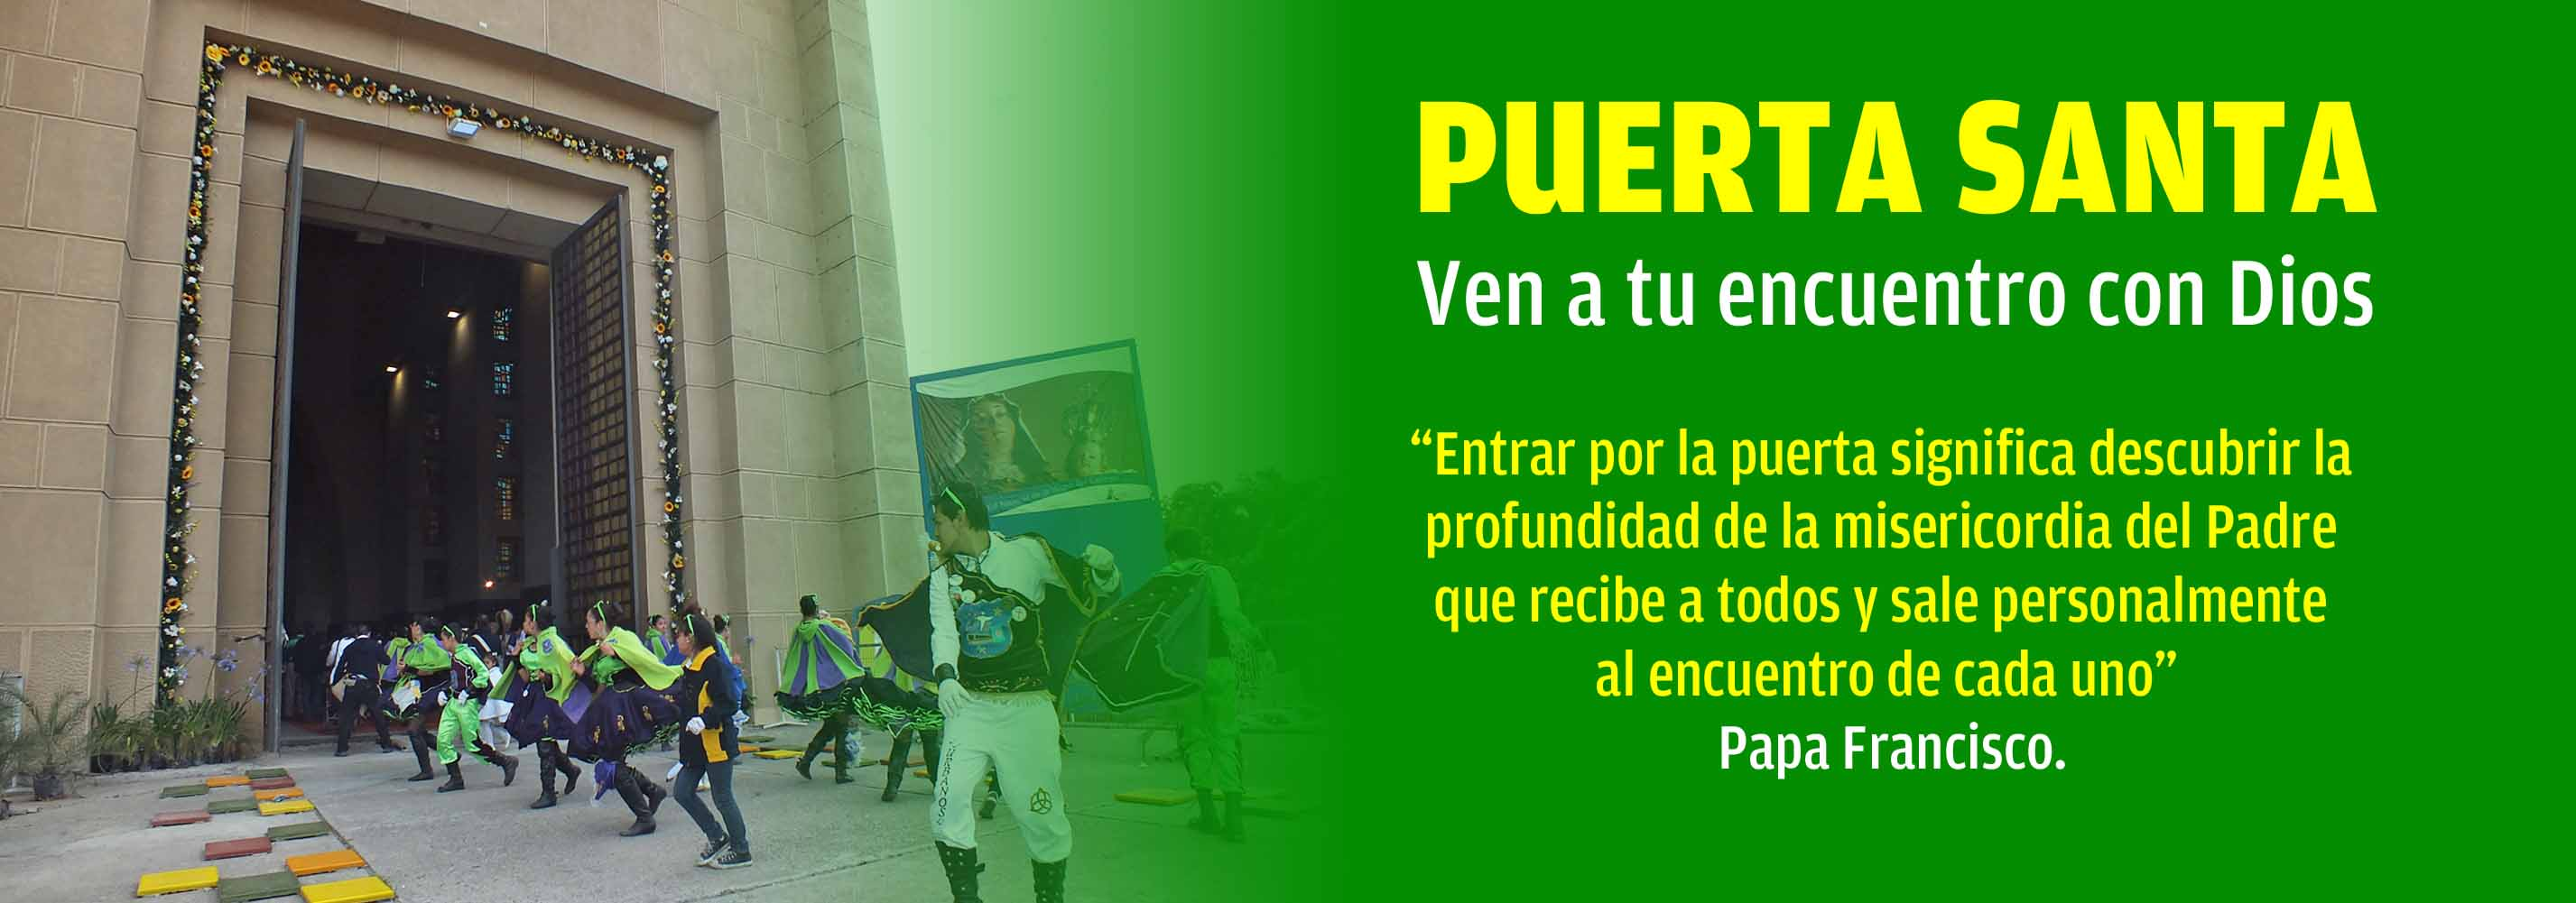 Banner-Puerta-Santa-2015-2